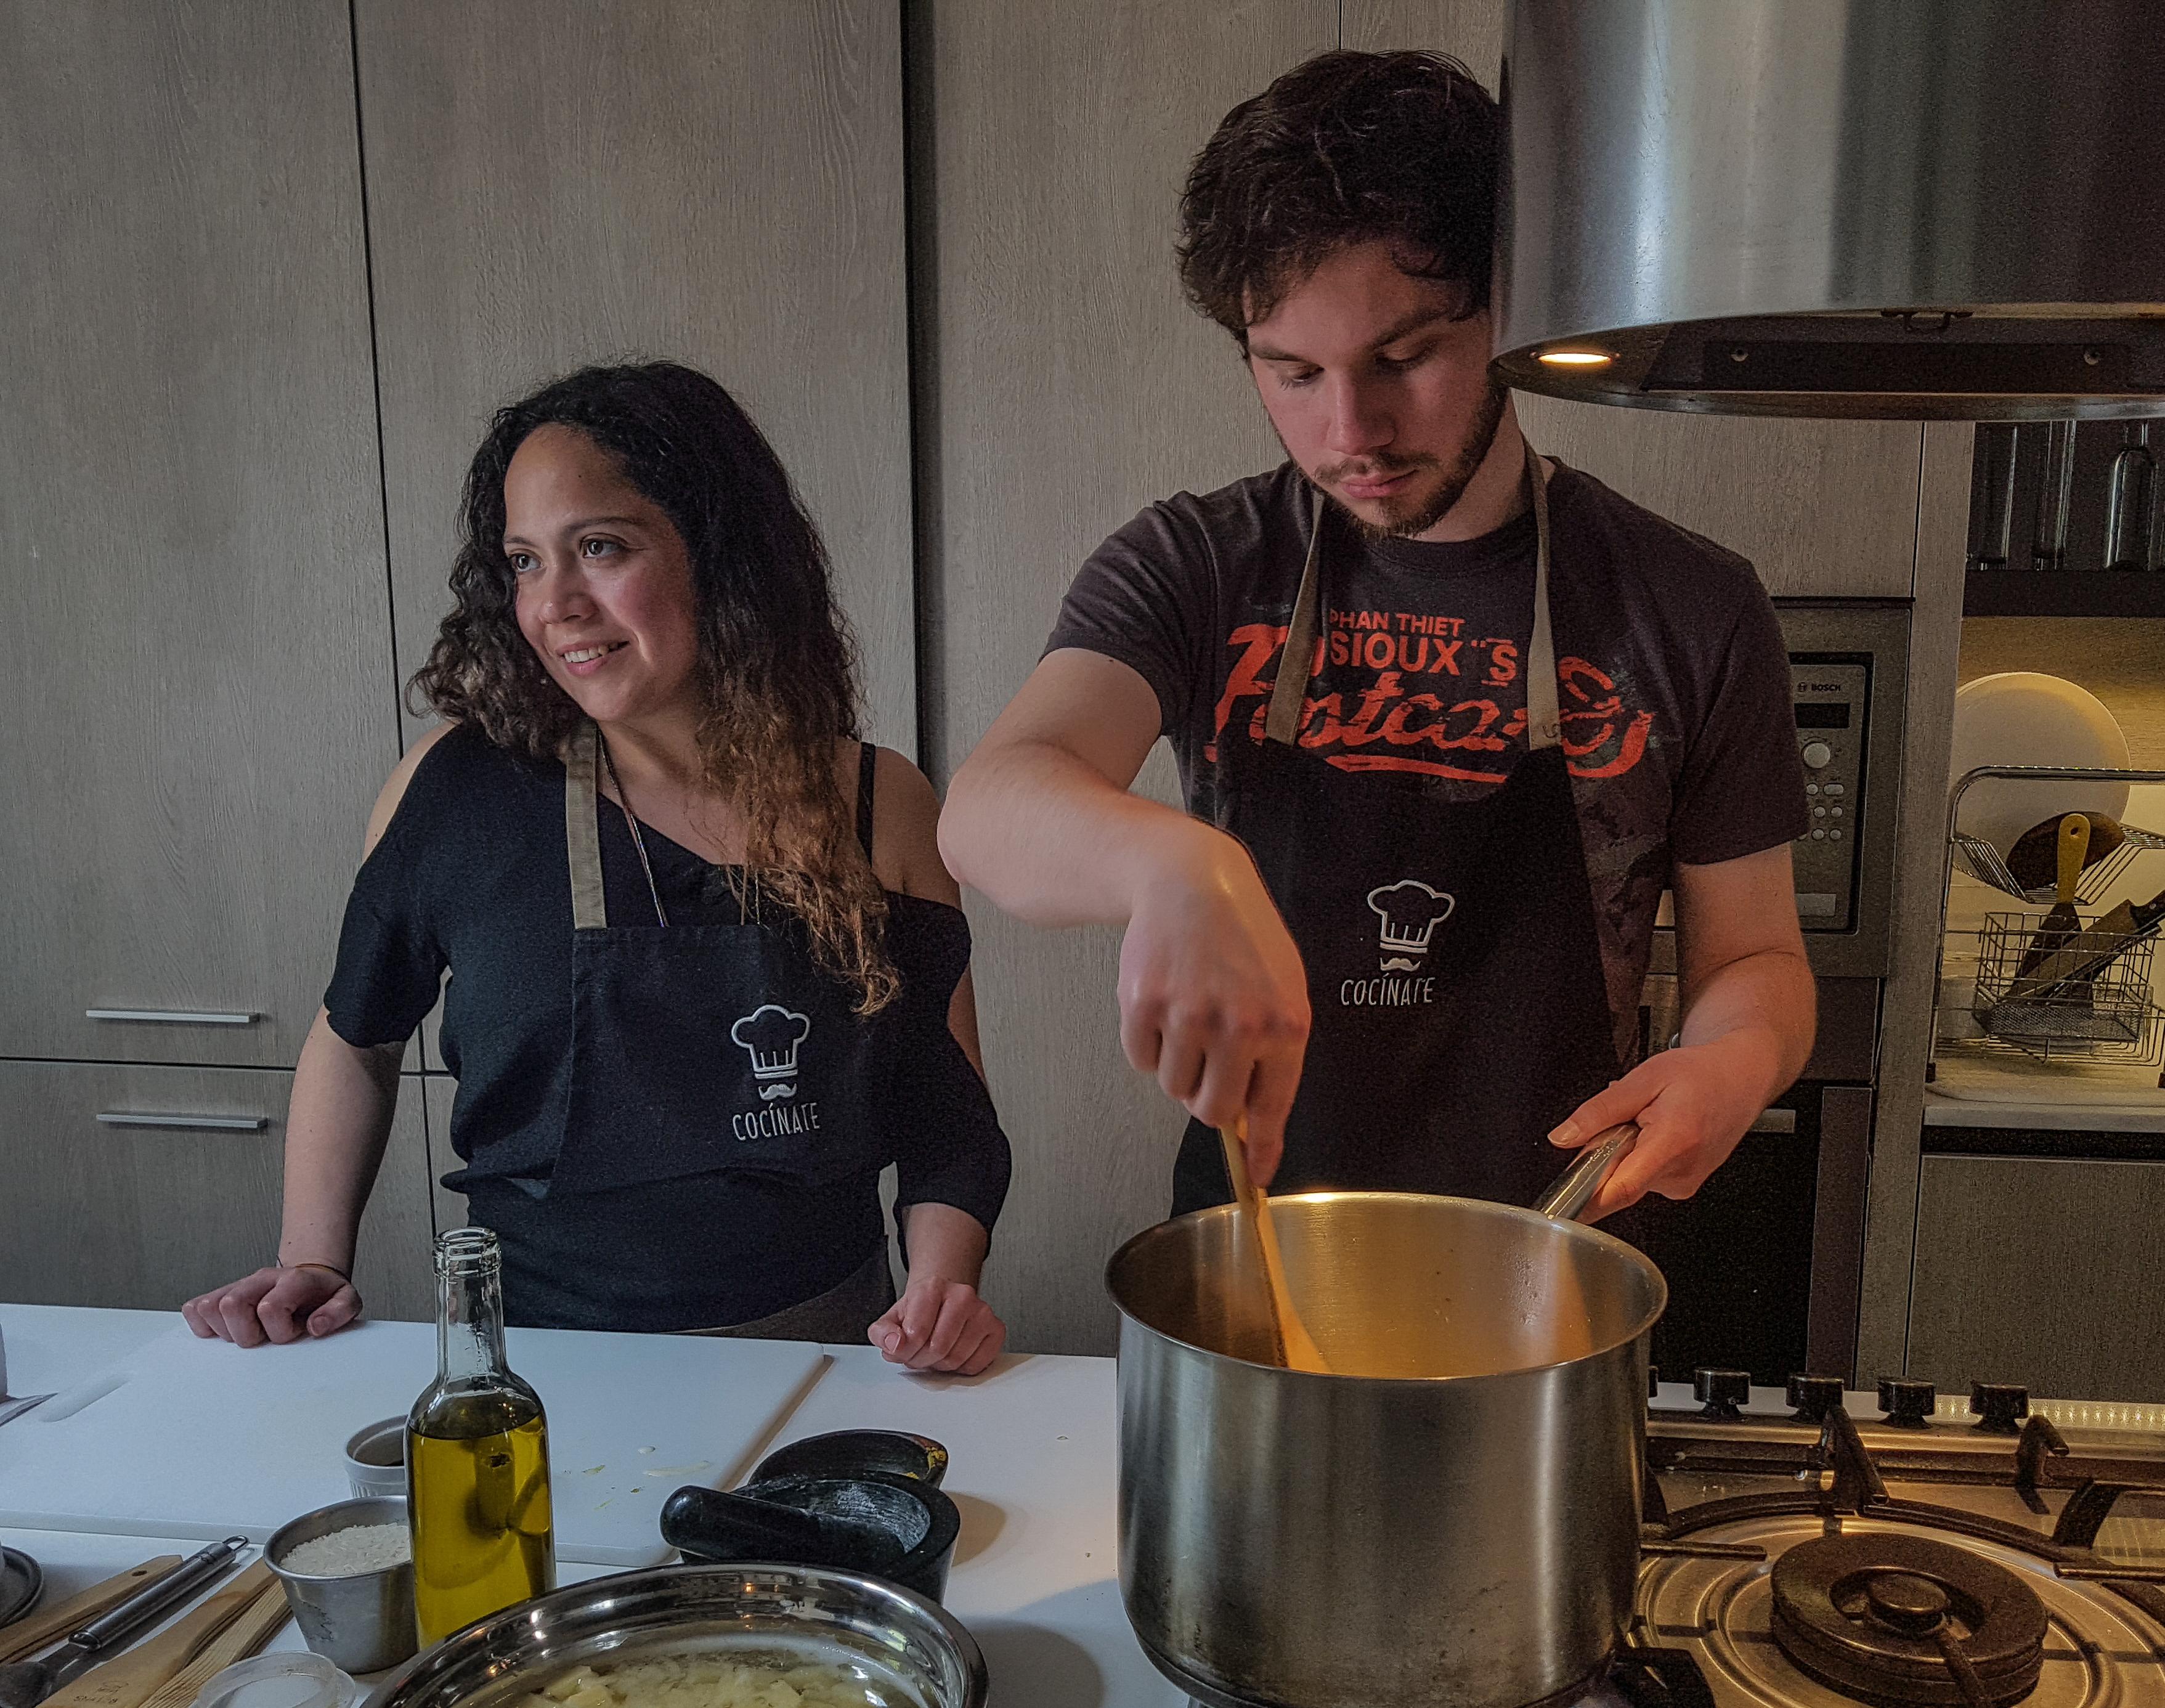 clases de cocina cocinate